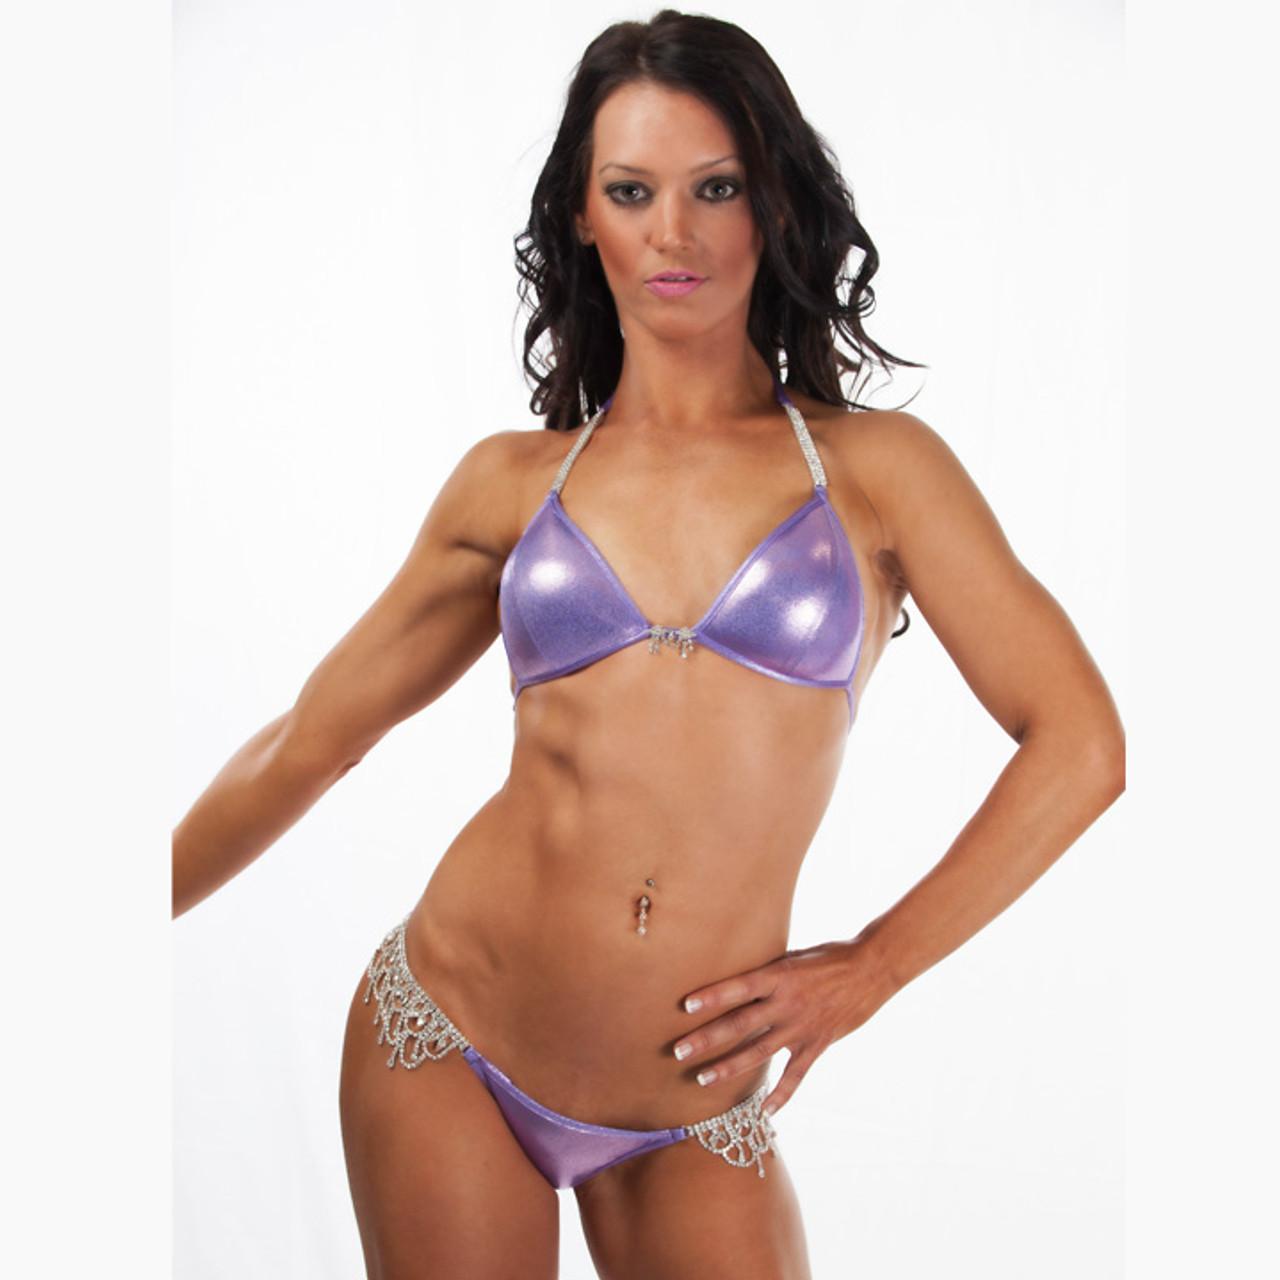 Car craft bikini pageant